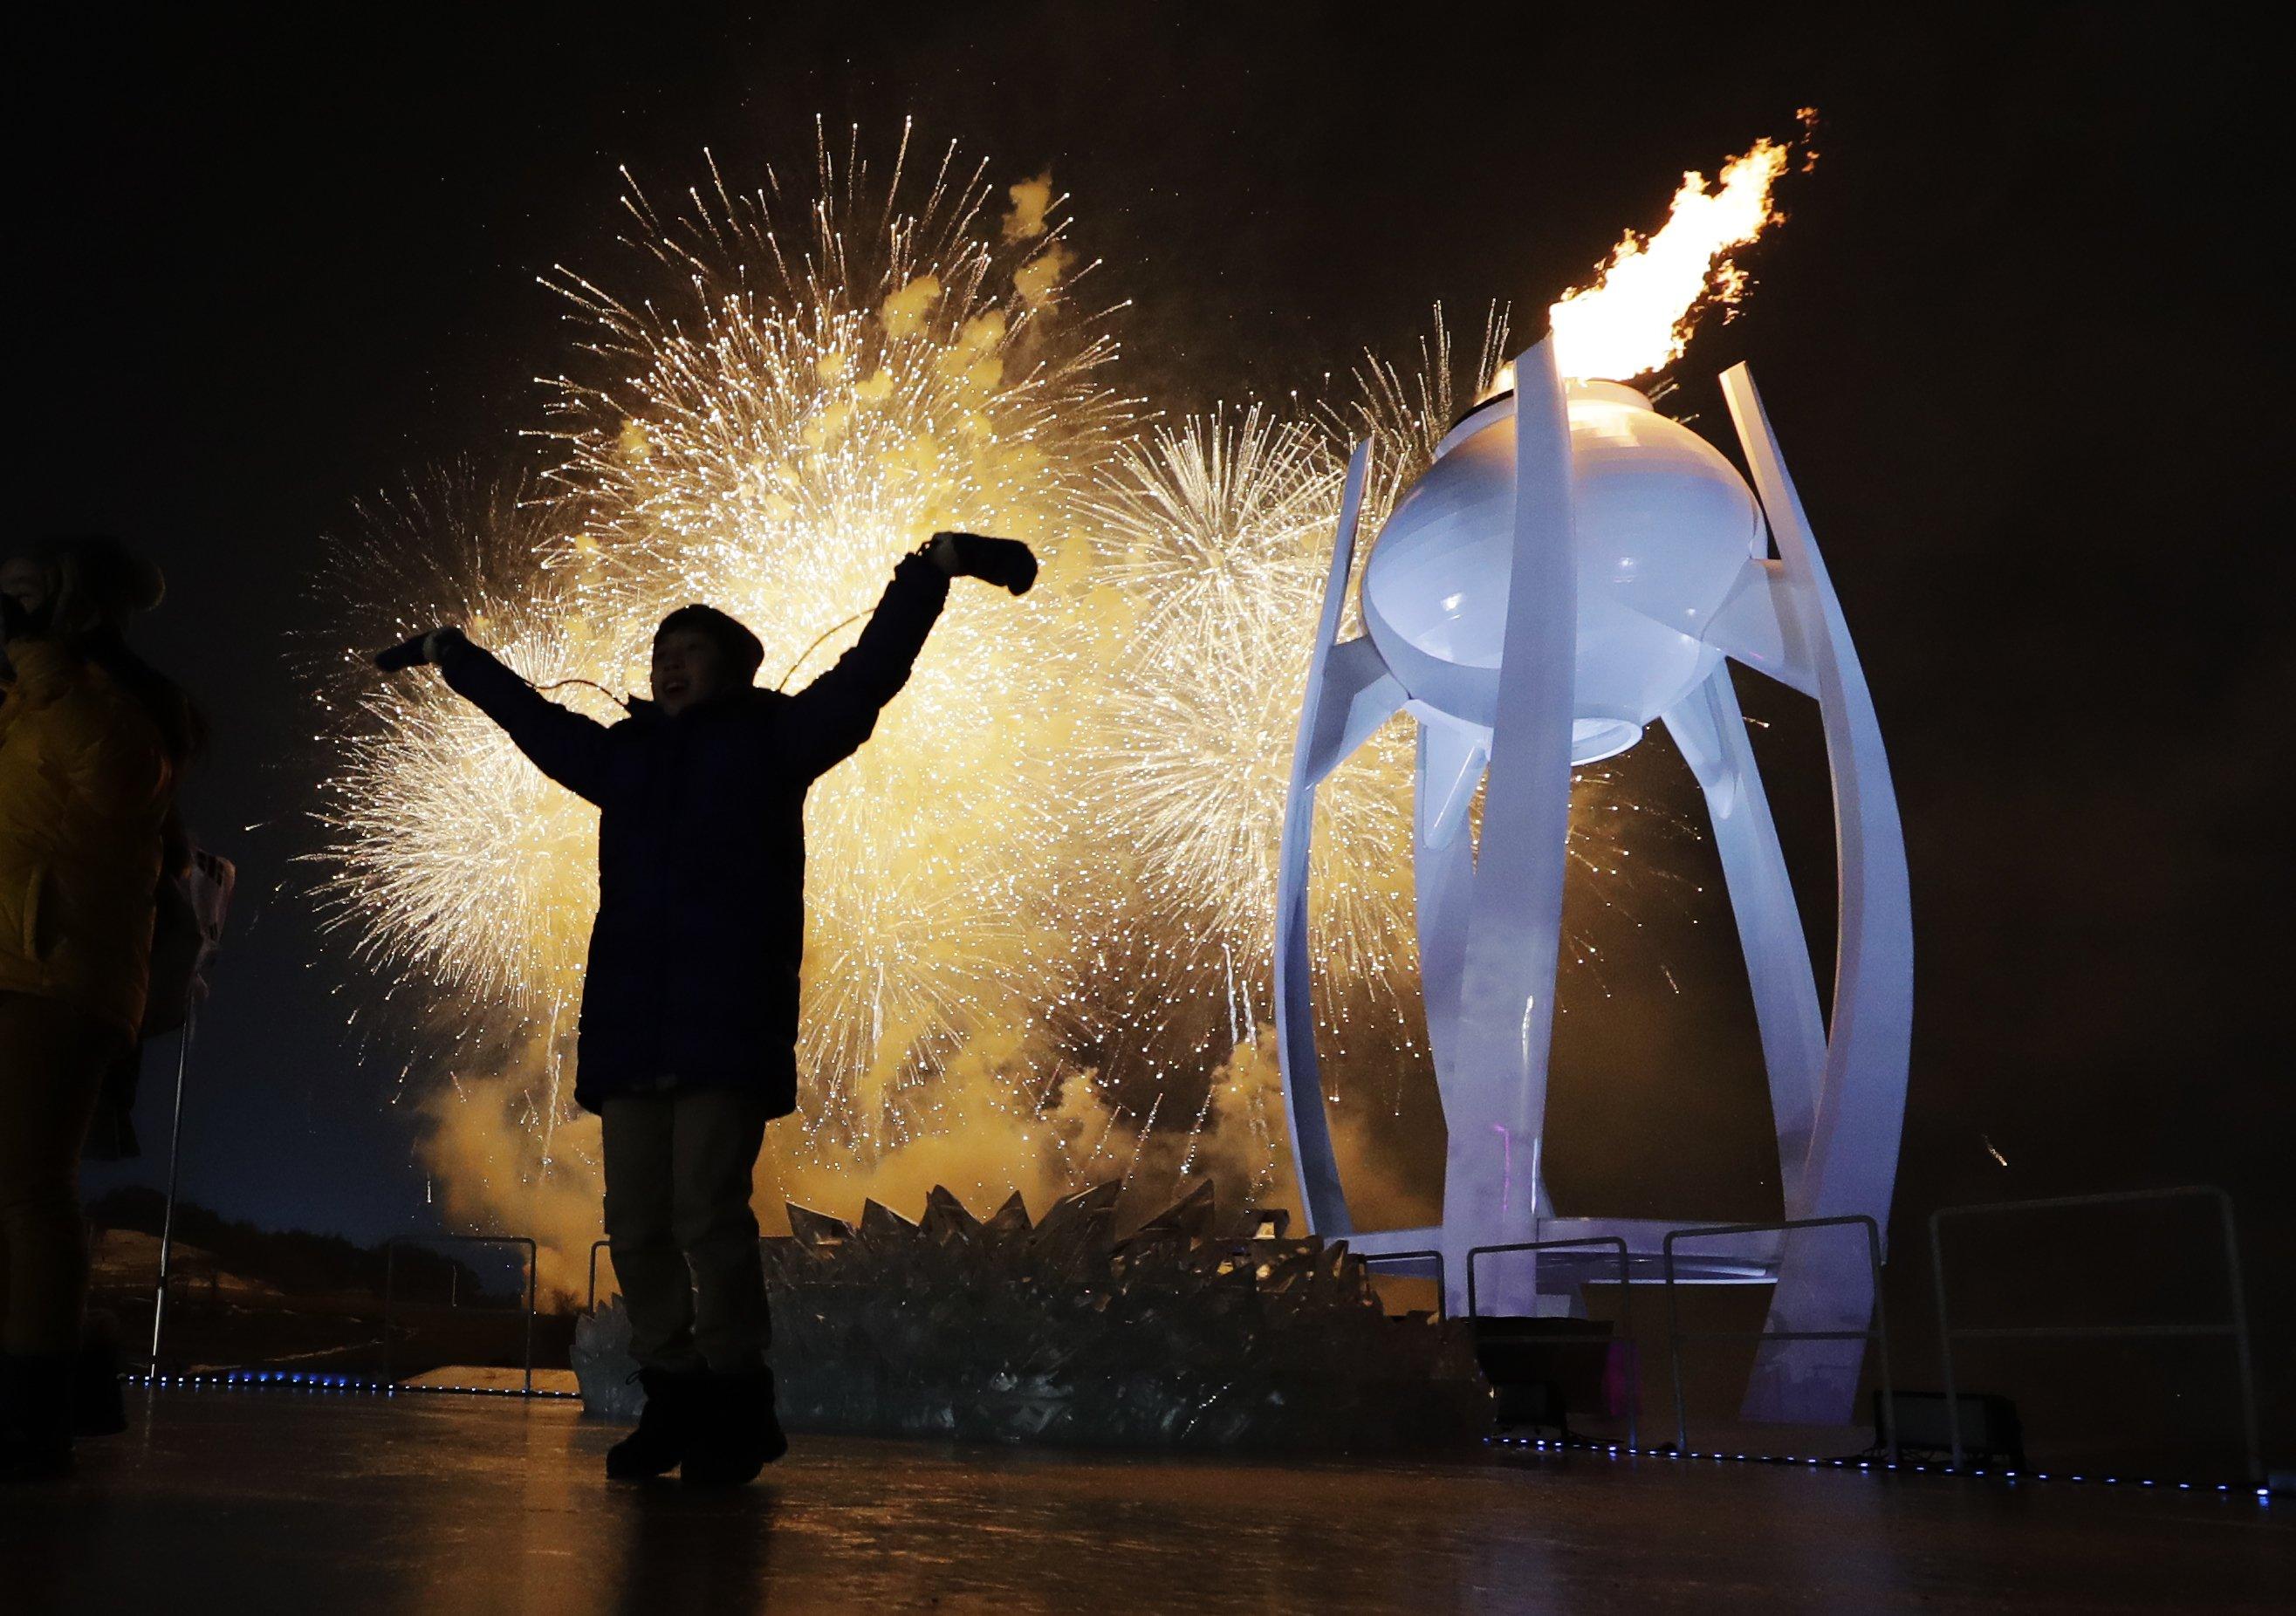 At Olympics, fiery optics both entertaining and symbolic